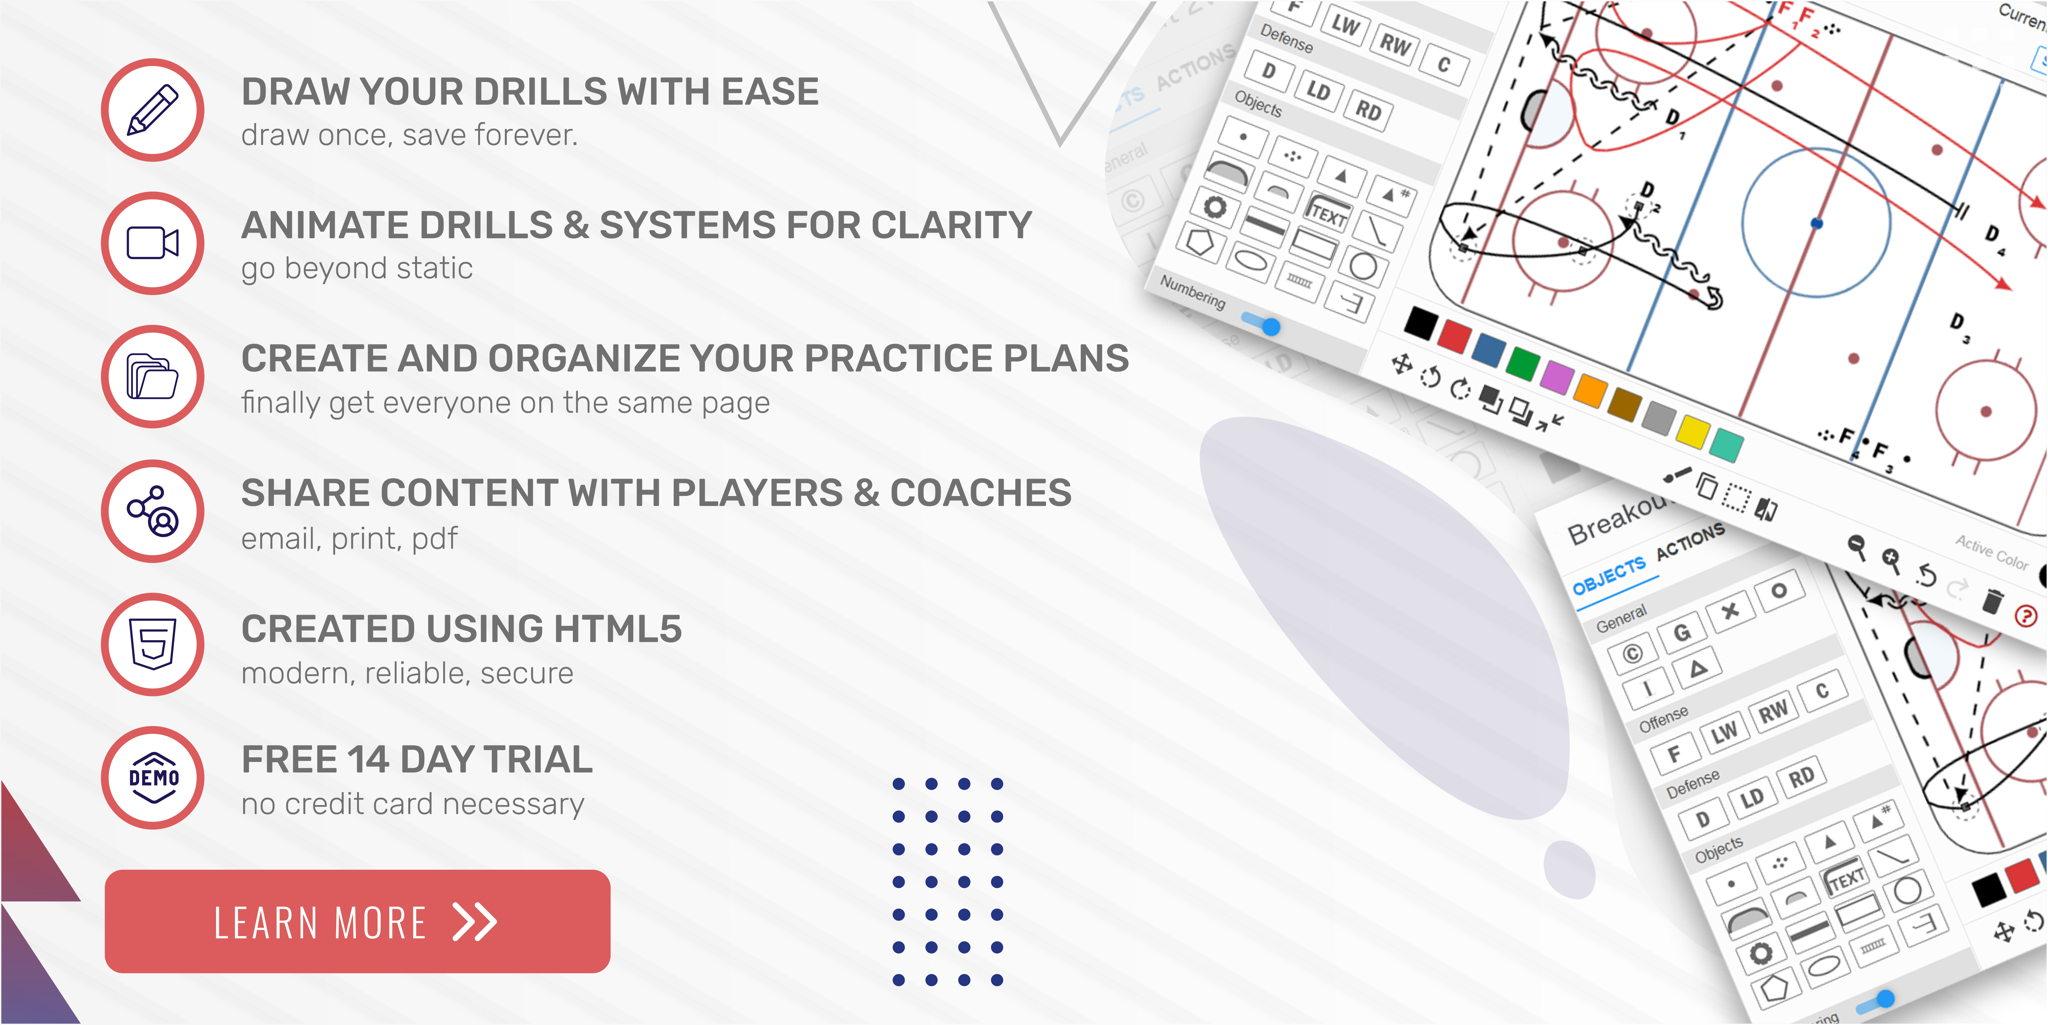 HockeyShare's Advanced Coaching Platform